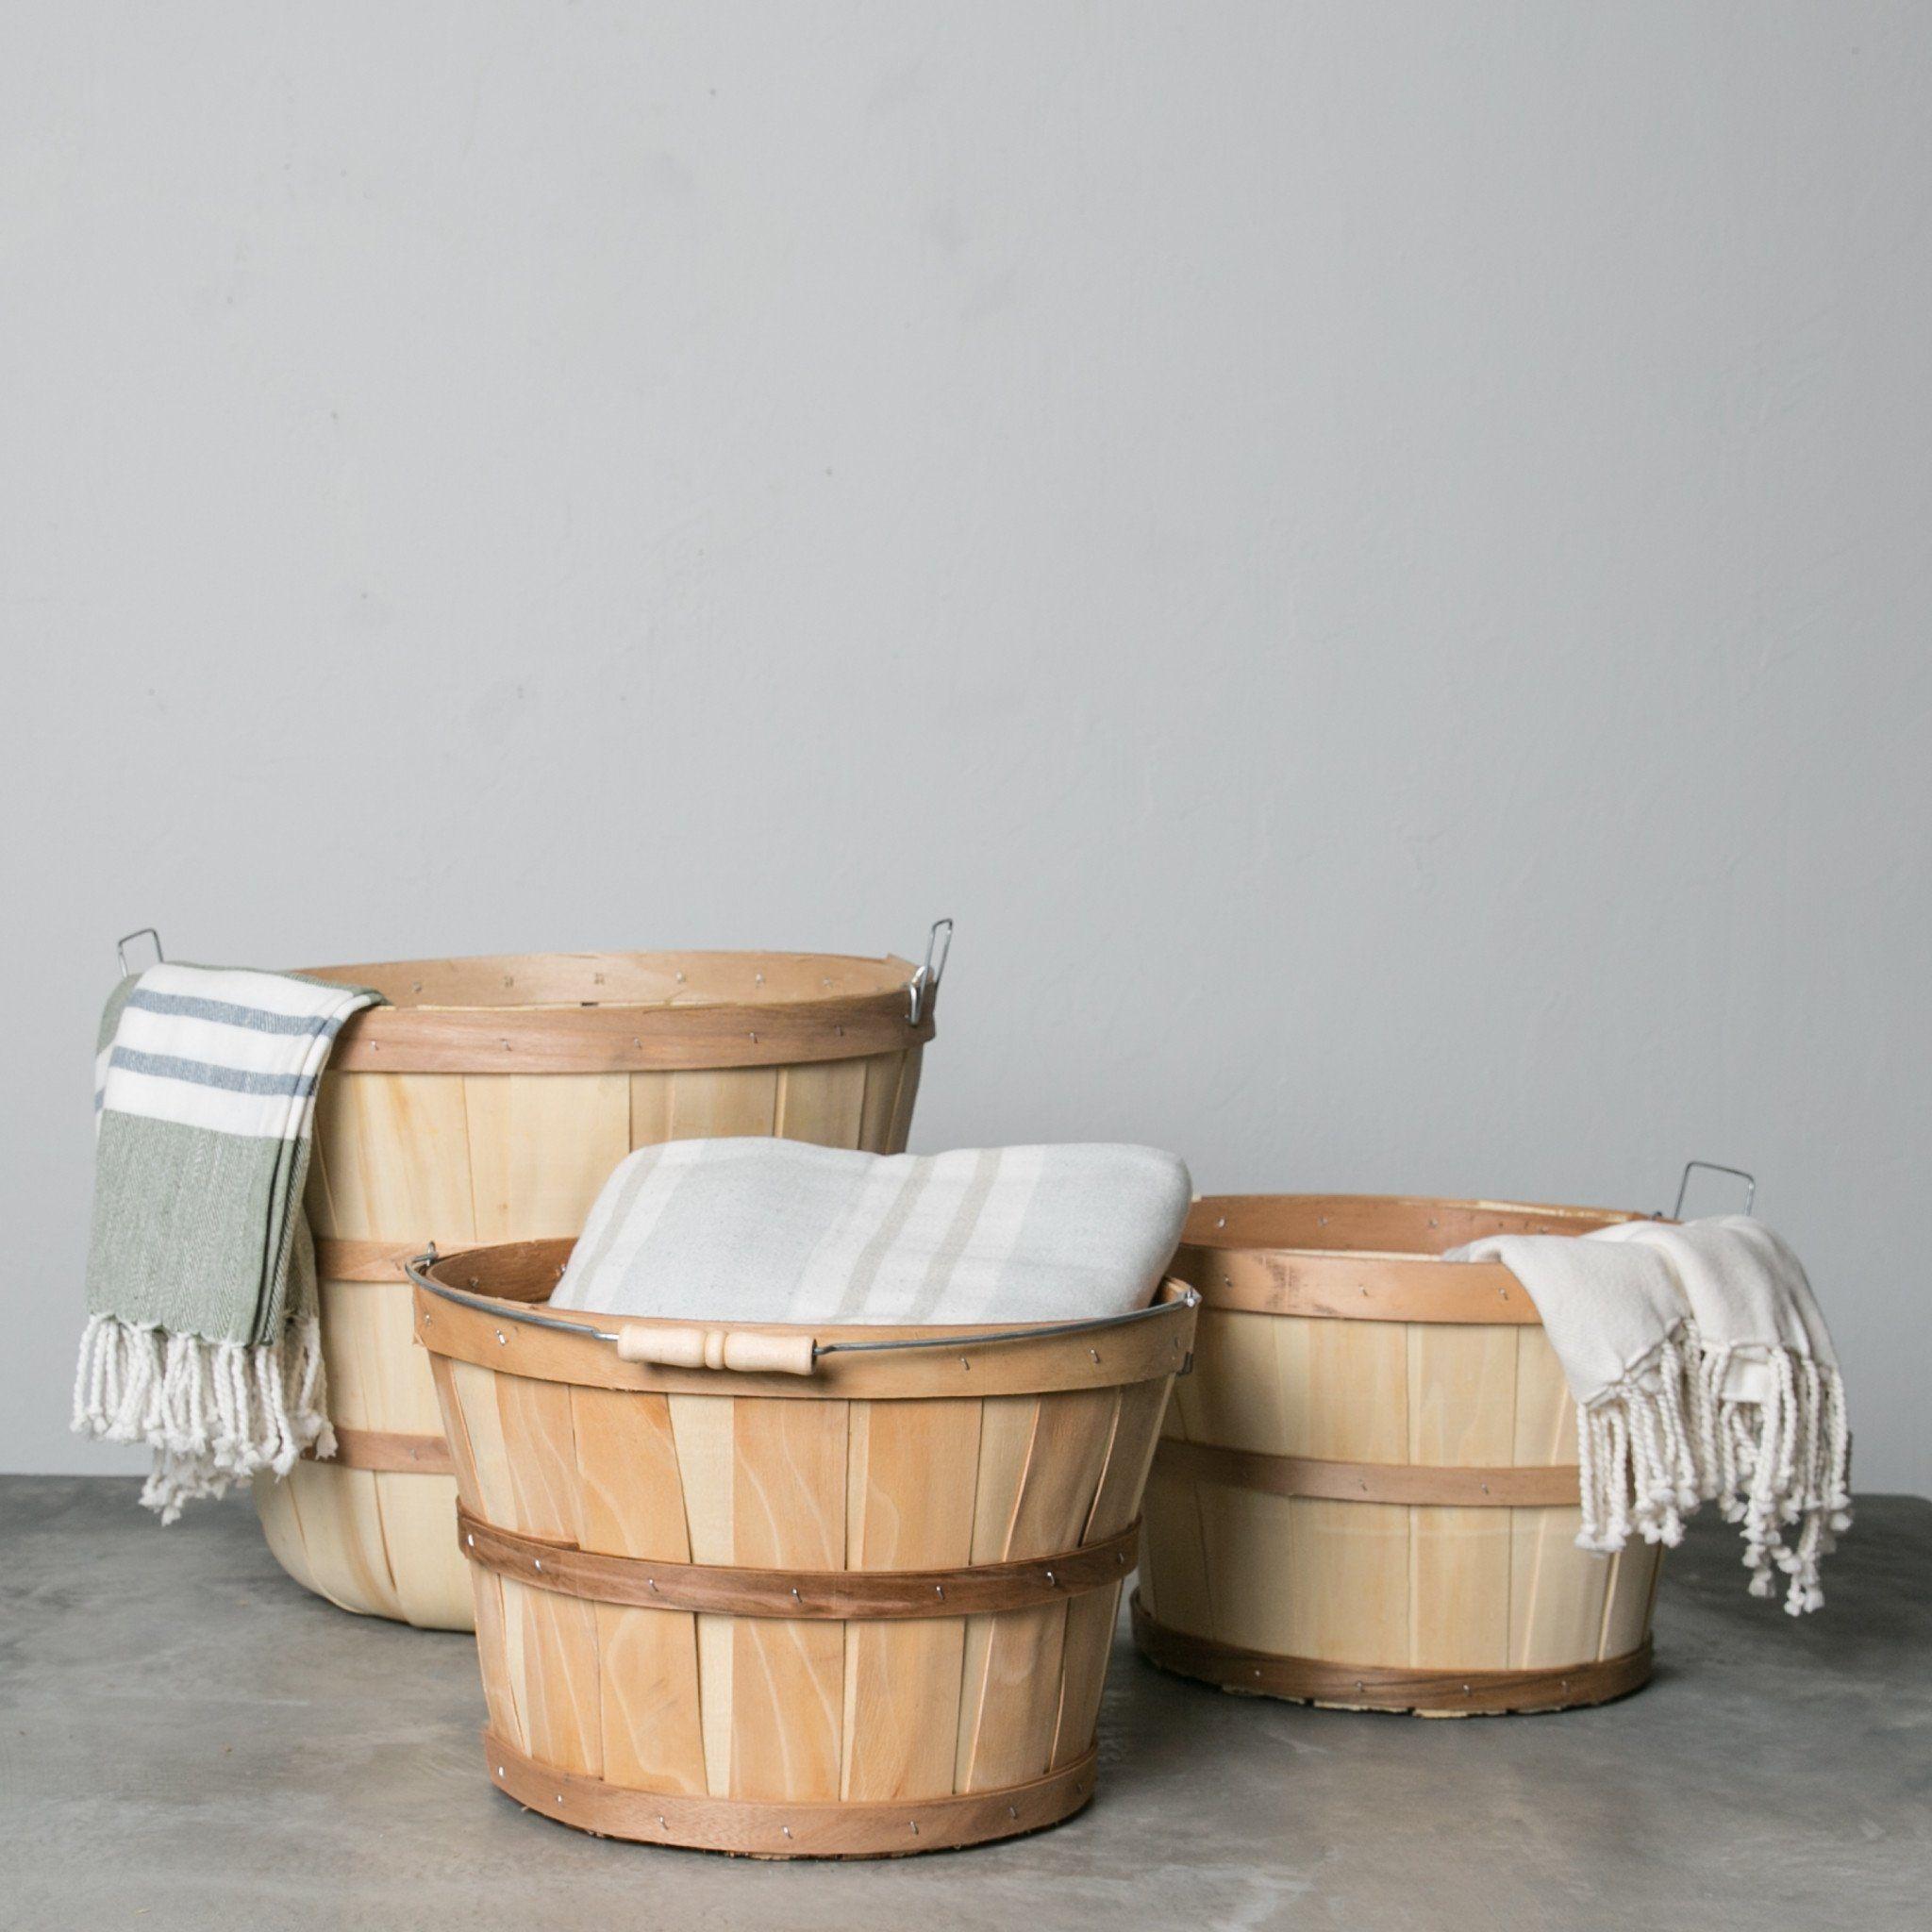 Bushel Basket Magnolia Market Chip Joanna Gaines Our Bushel